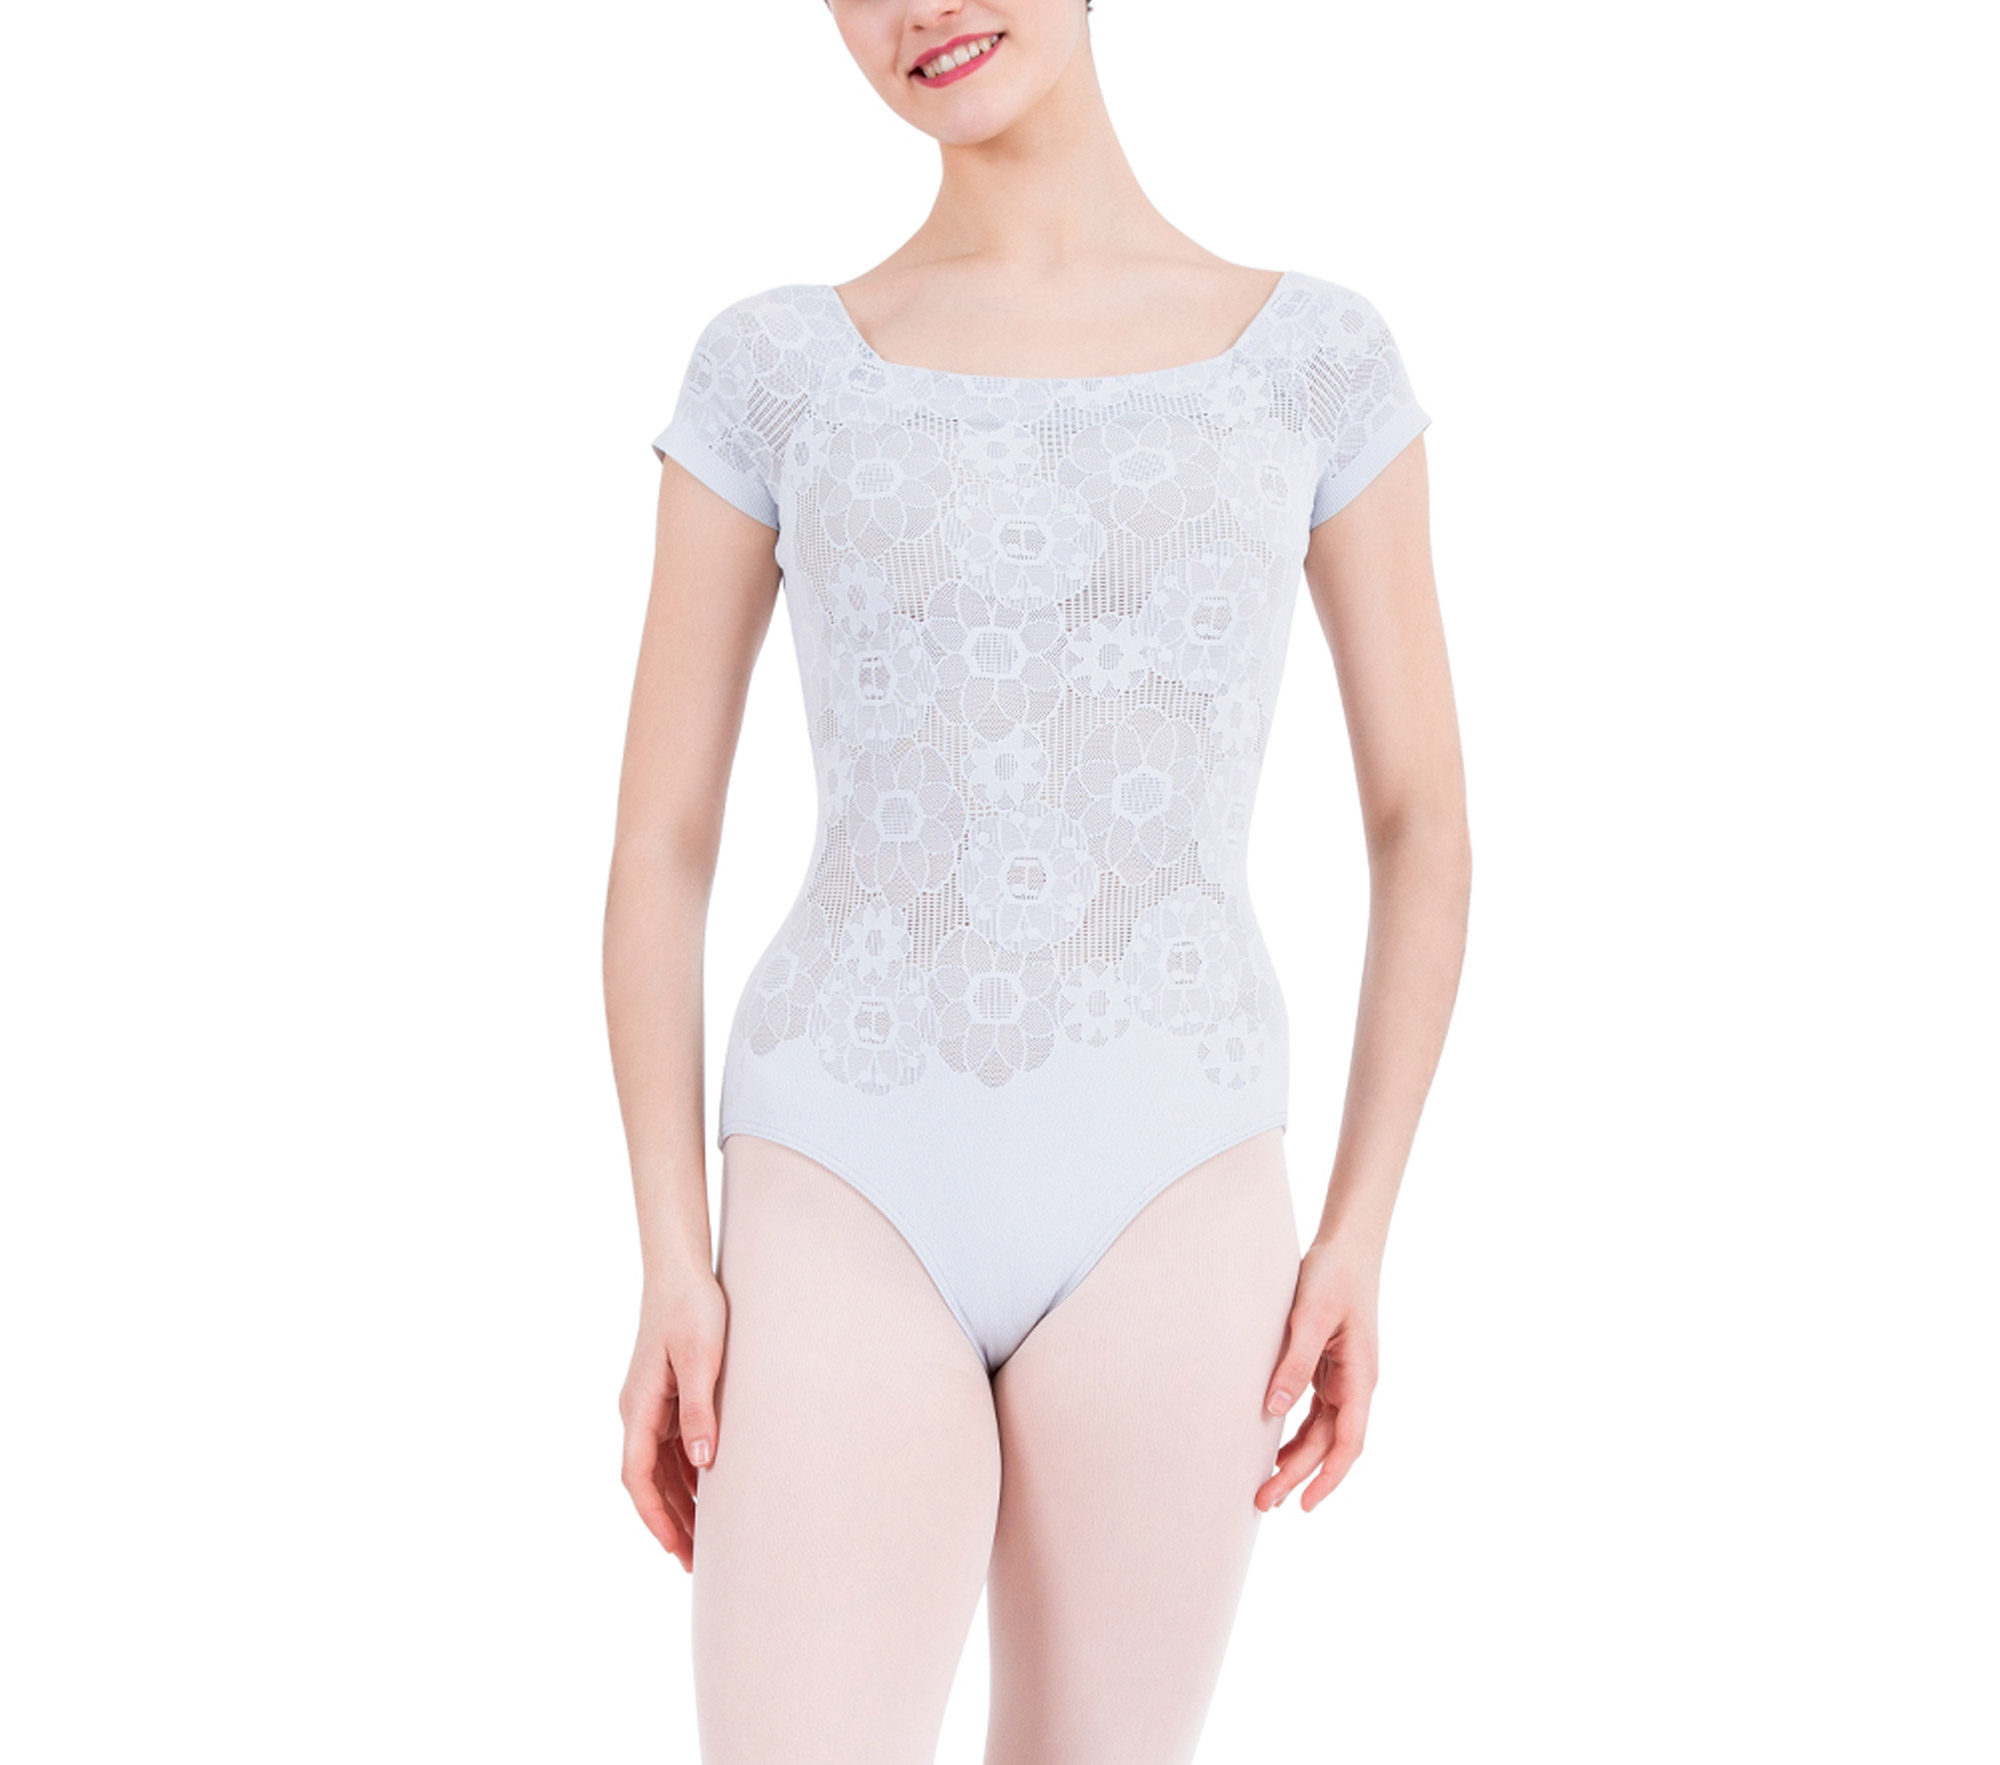 Short sleeves lace leotard